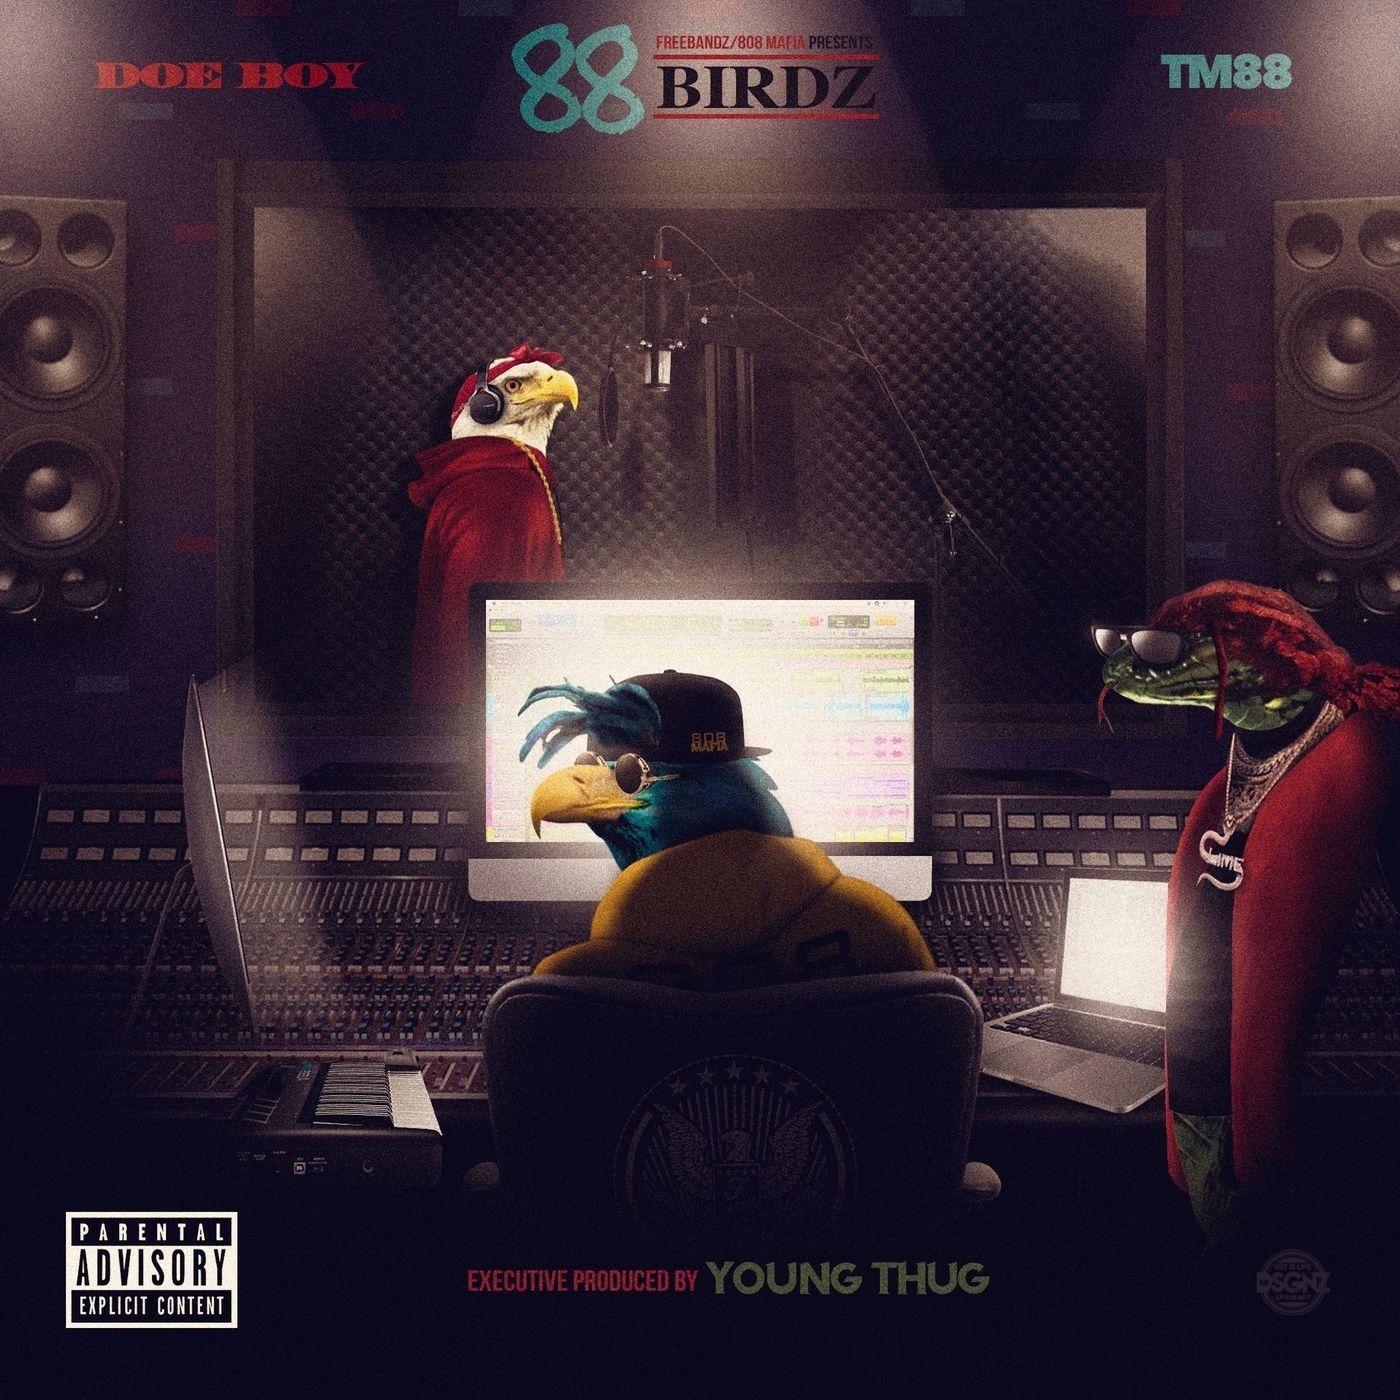 88 Birdz by Doe Boy & TM88, from RAPSTAR: Listen for Free